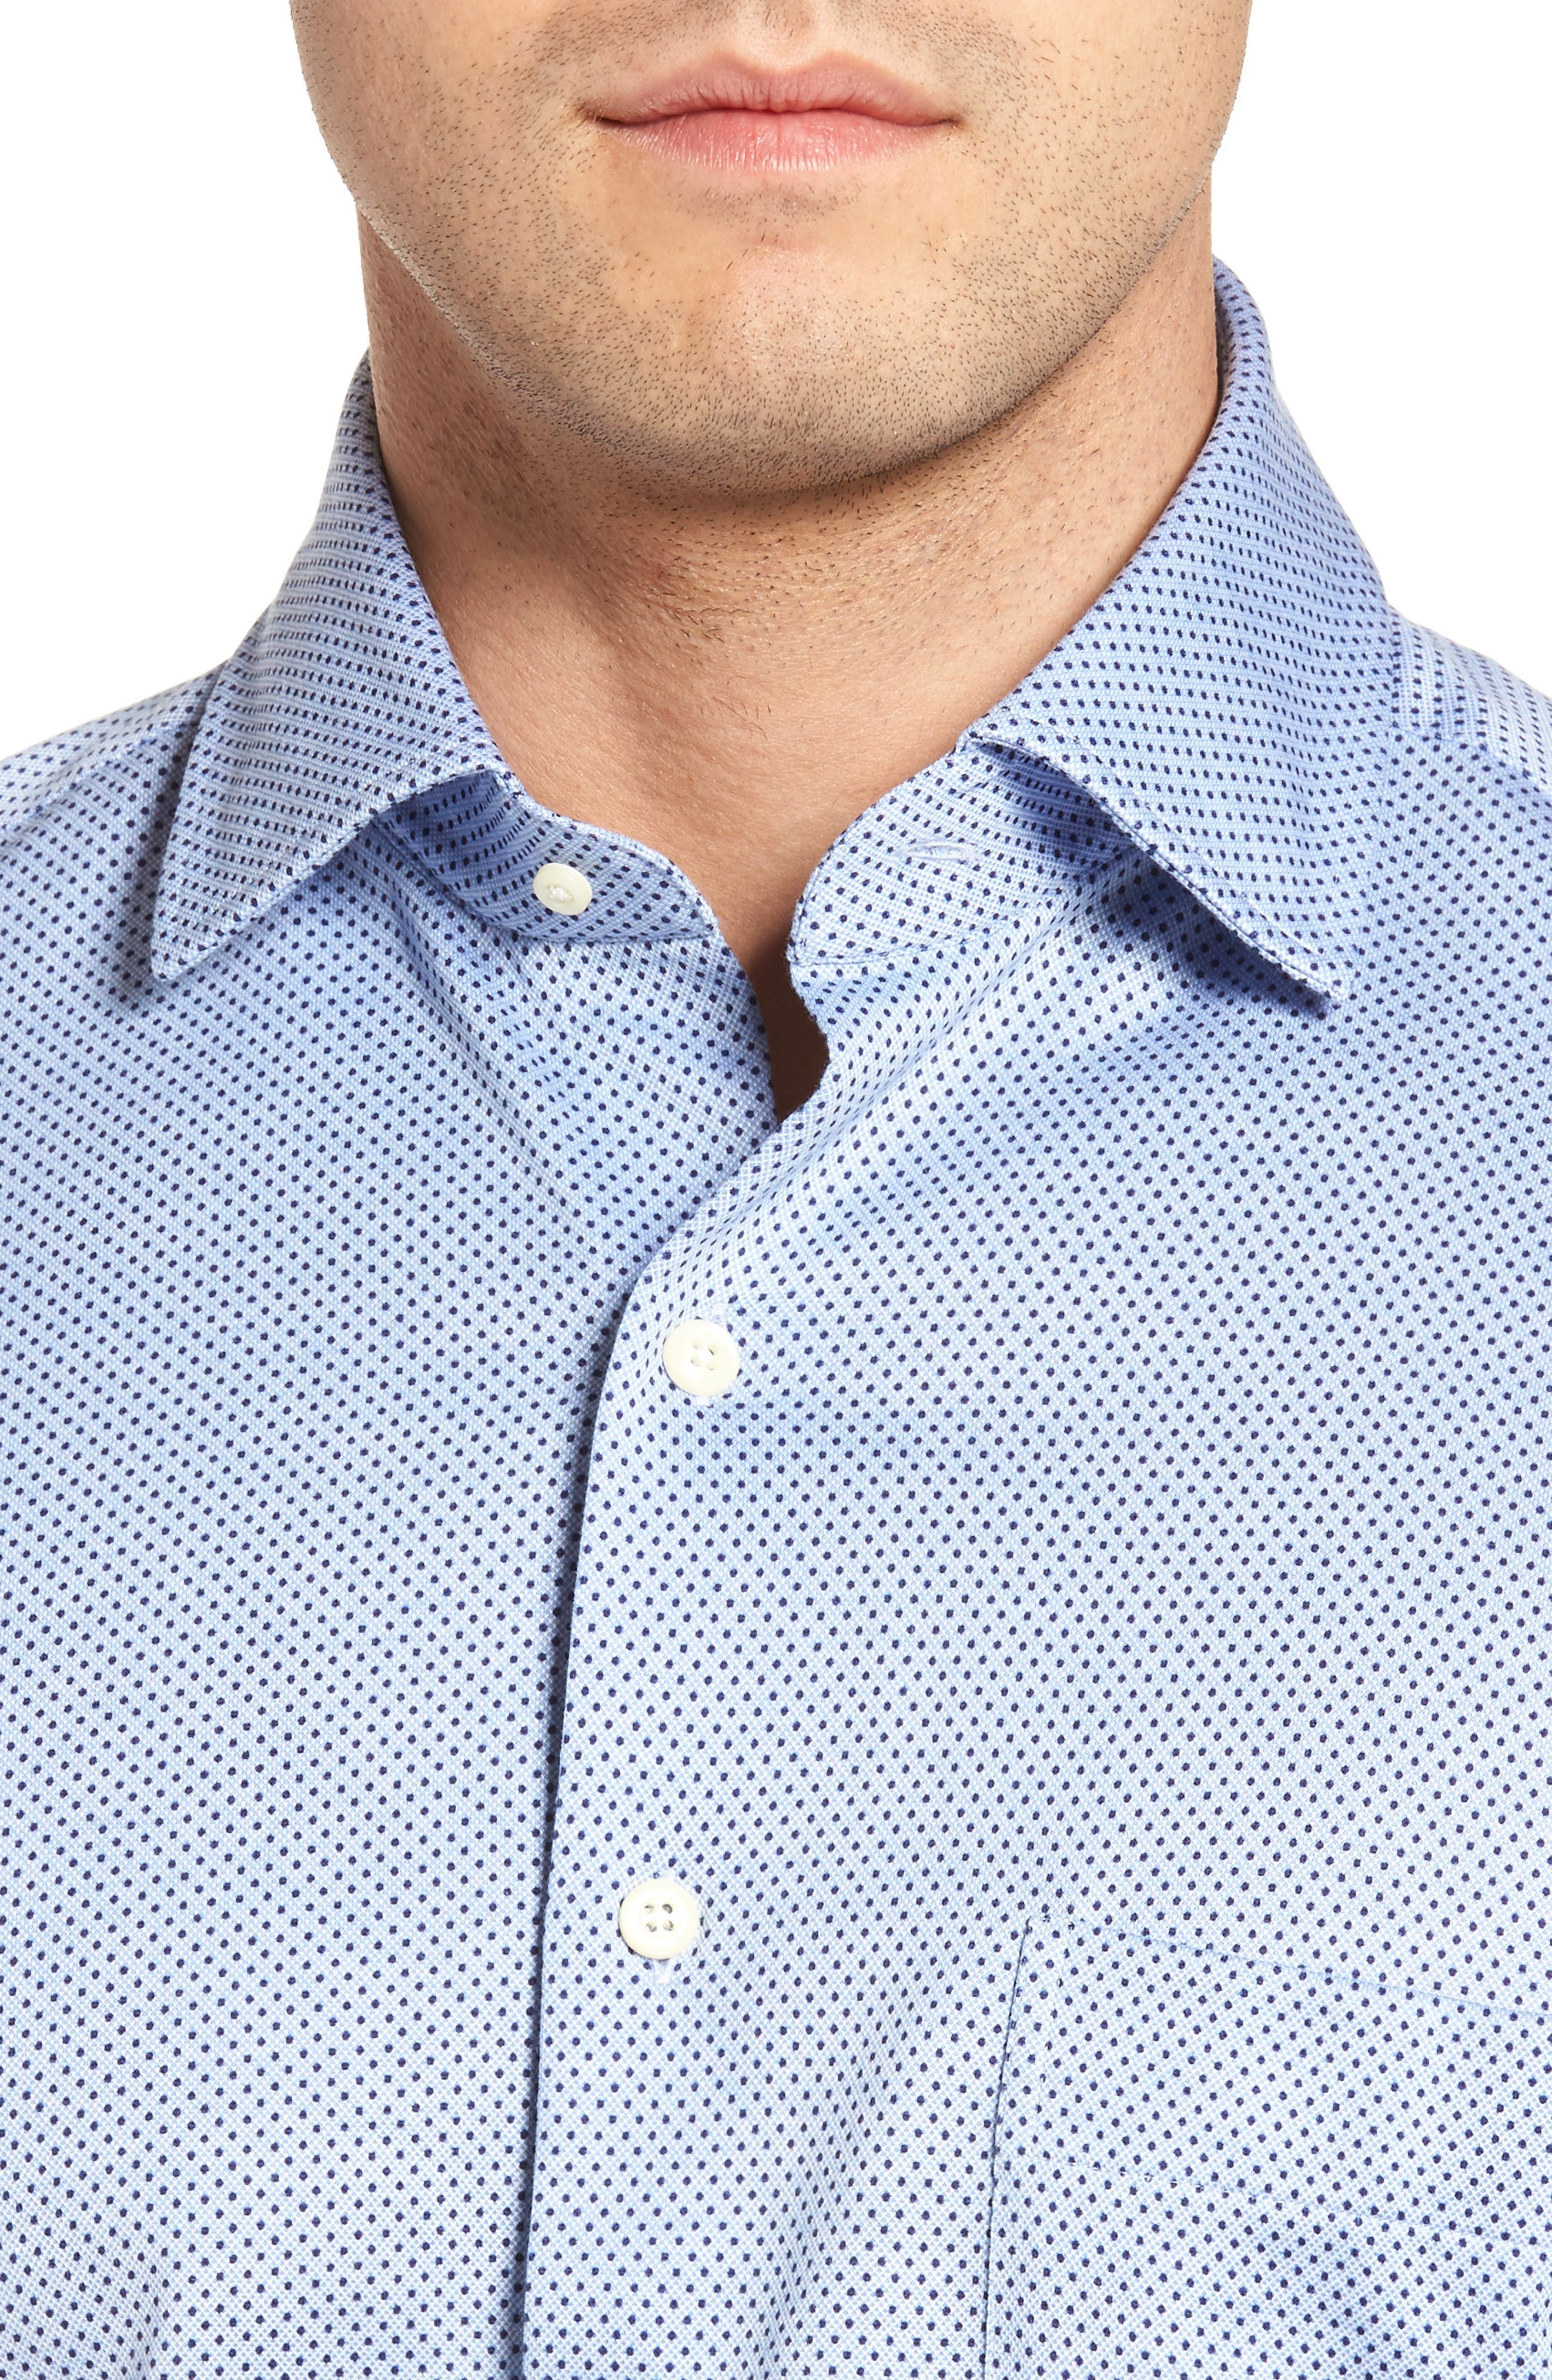 Mesh Dot Classic Fit Sport Shirt,                             Alternate thumbnail 4, color,                             Tar Heel Blue